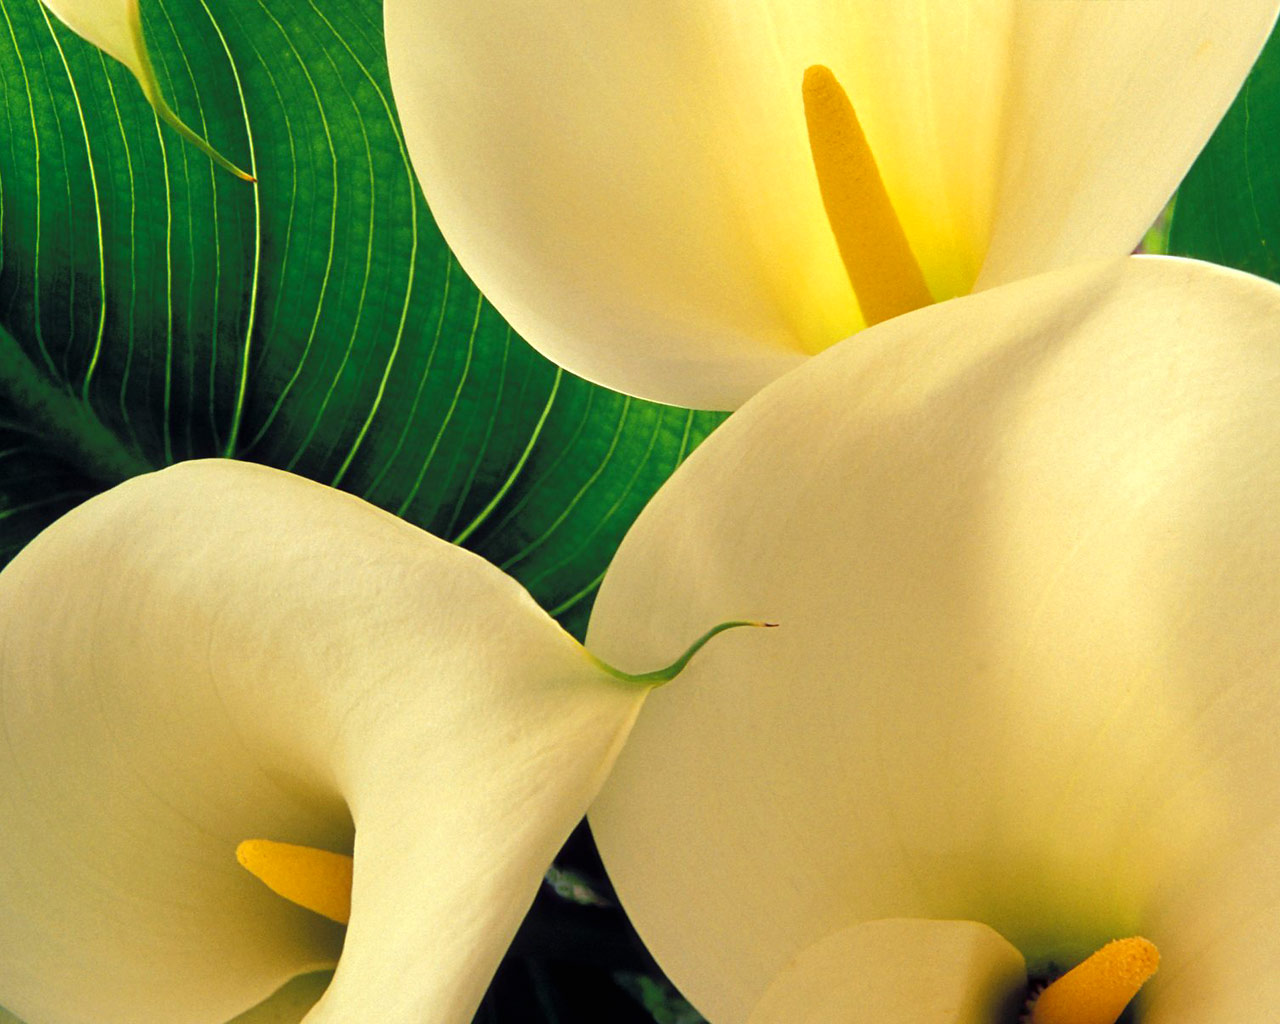 xpx Calla Lilies Wallpaper